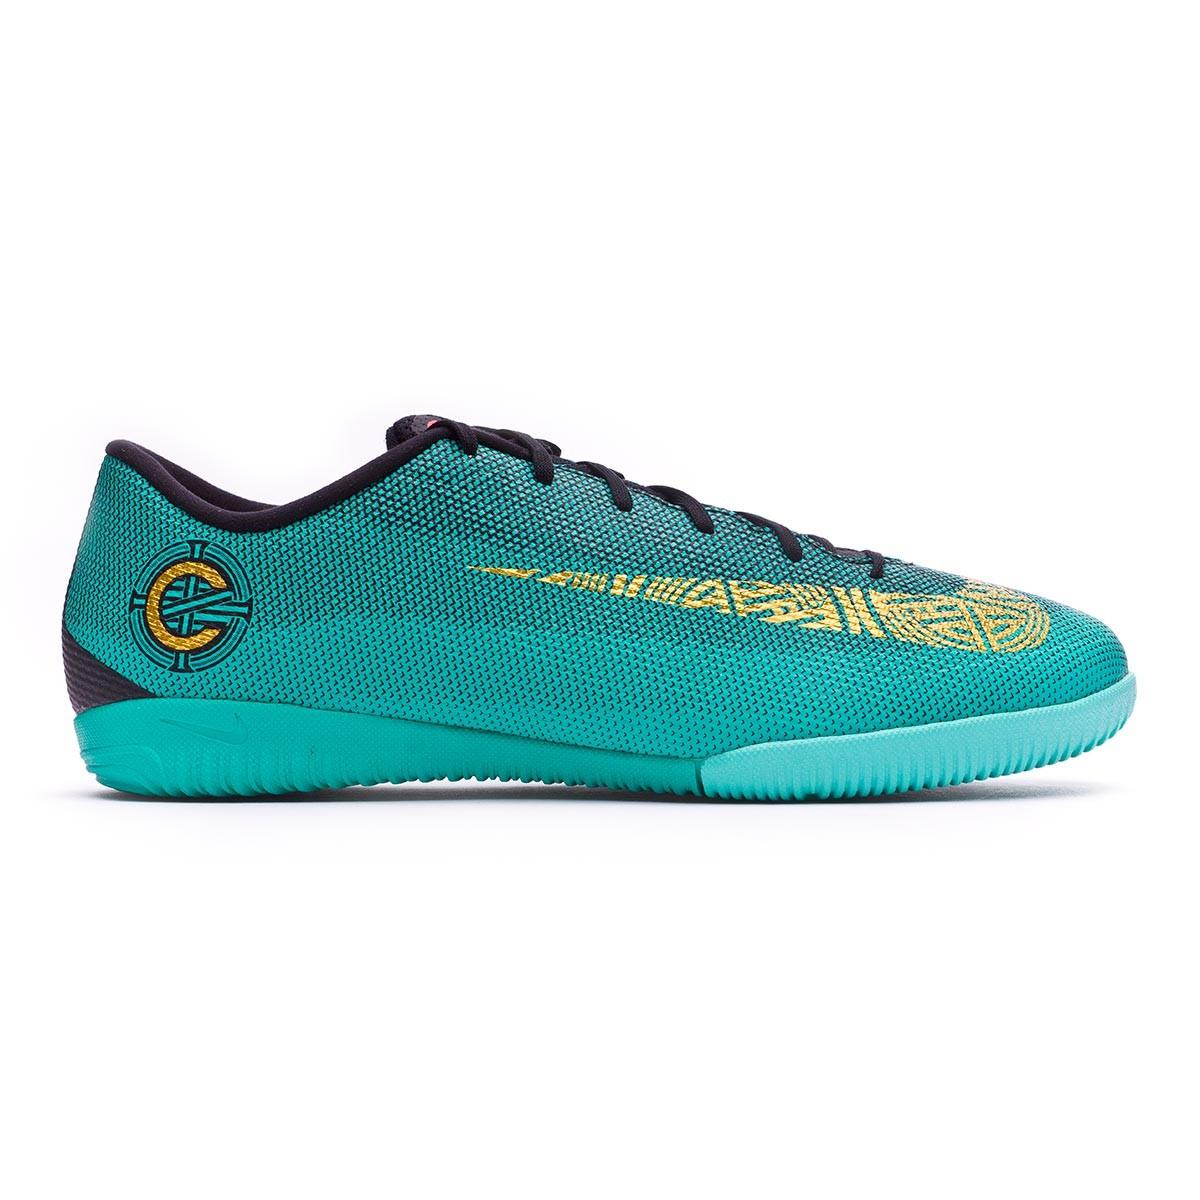 15e7e6a57e7a Futsal Boot Nike Mercurial VaporX XII Academy CR7 IC Clear jade-Metallic  vivid gold-Black - Football store Fútbol Emotion